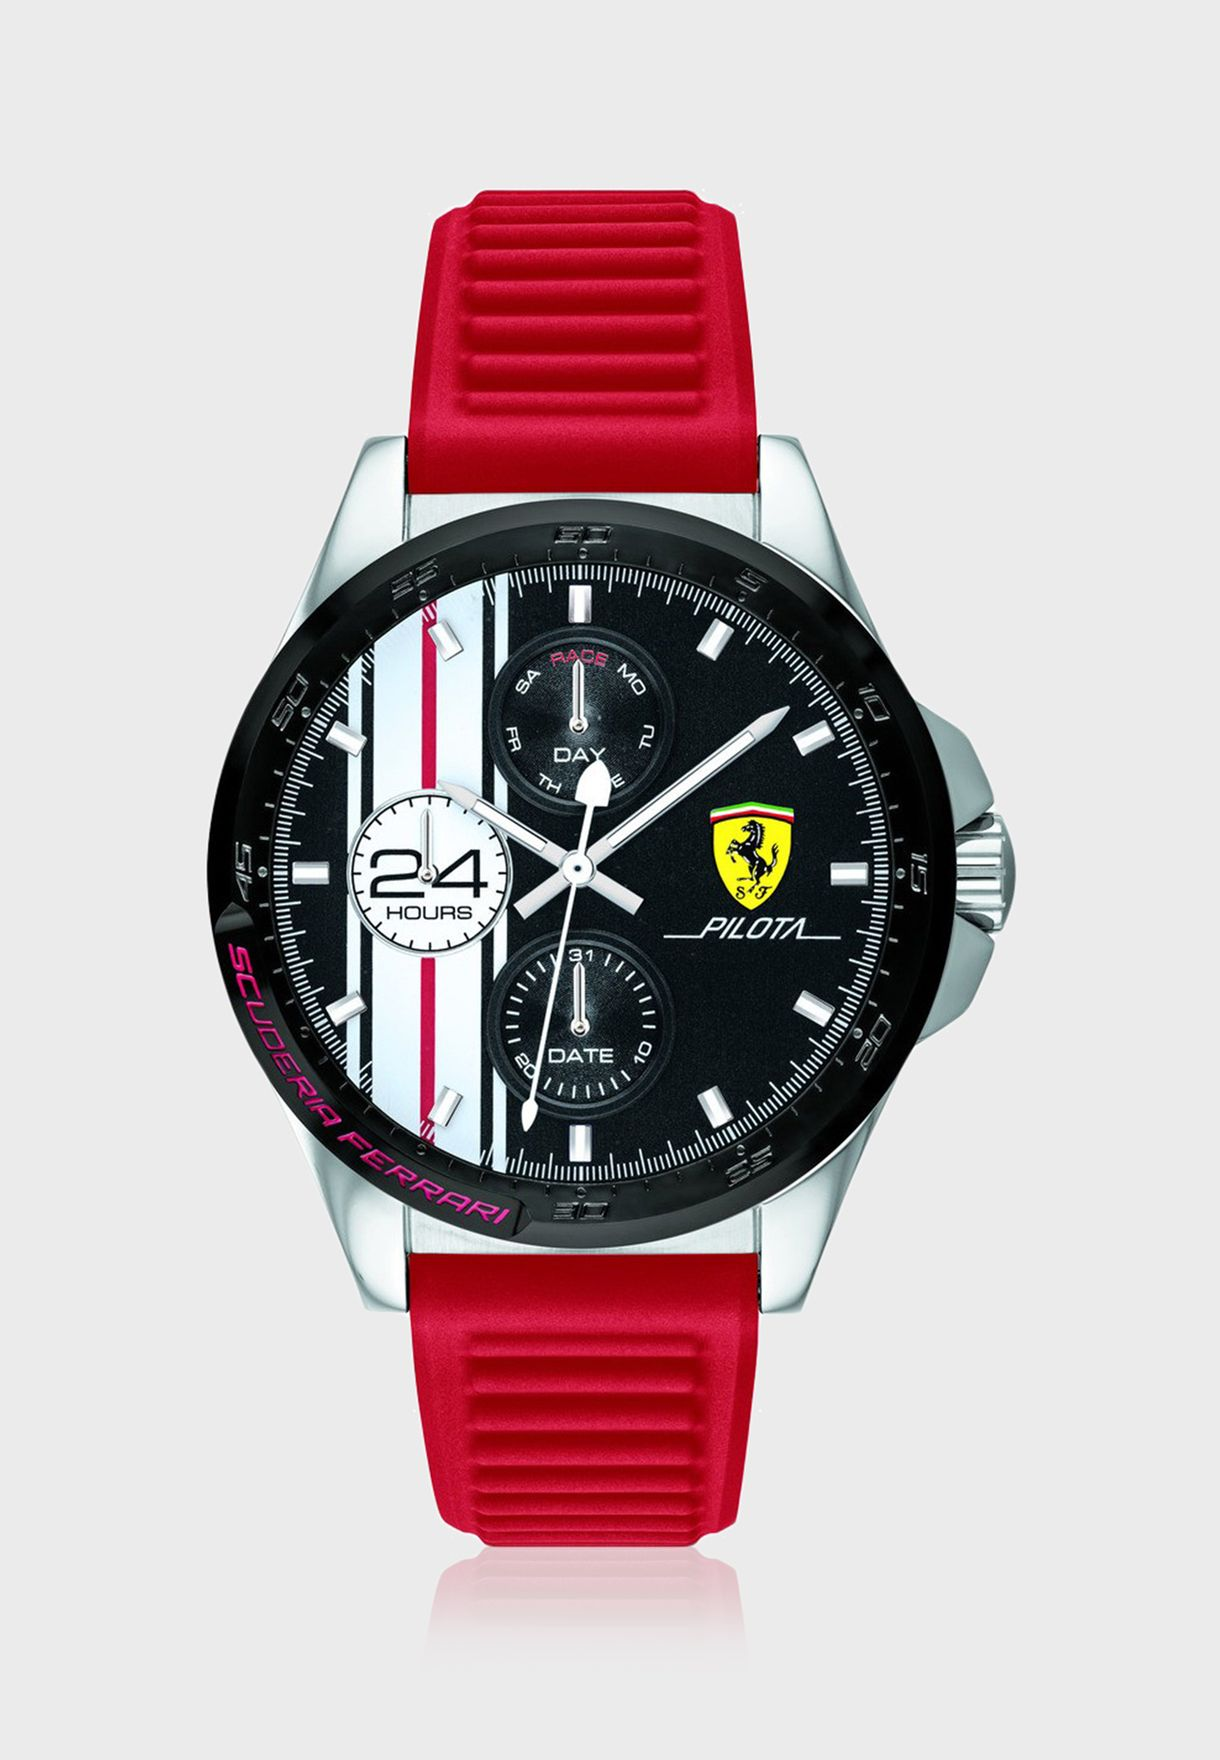 830657 Pilota Chronograph Watch